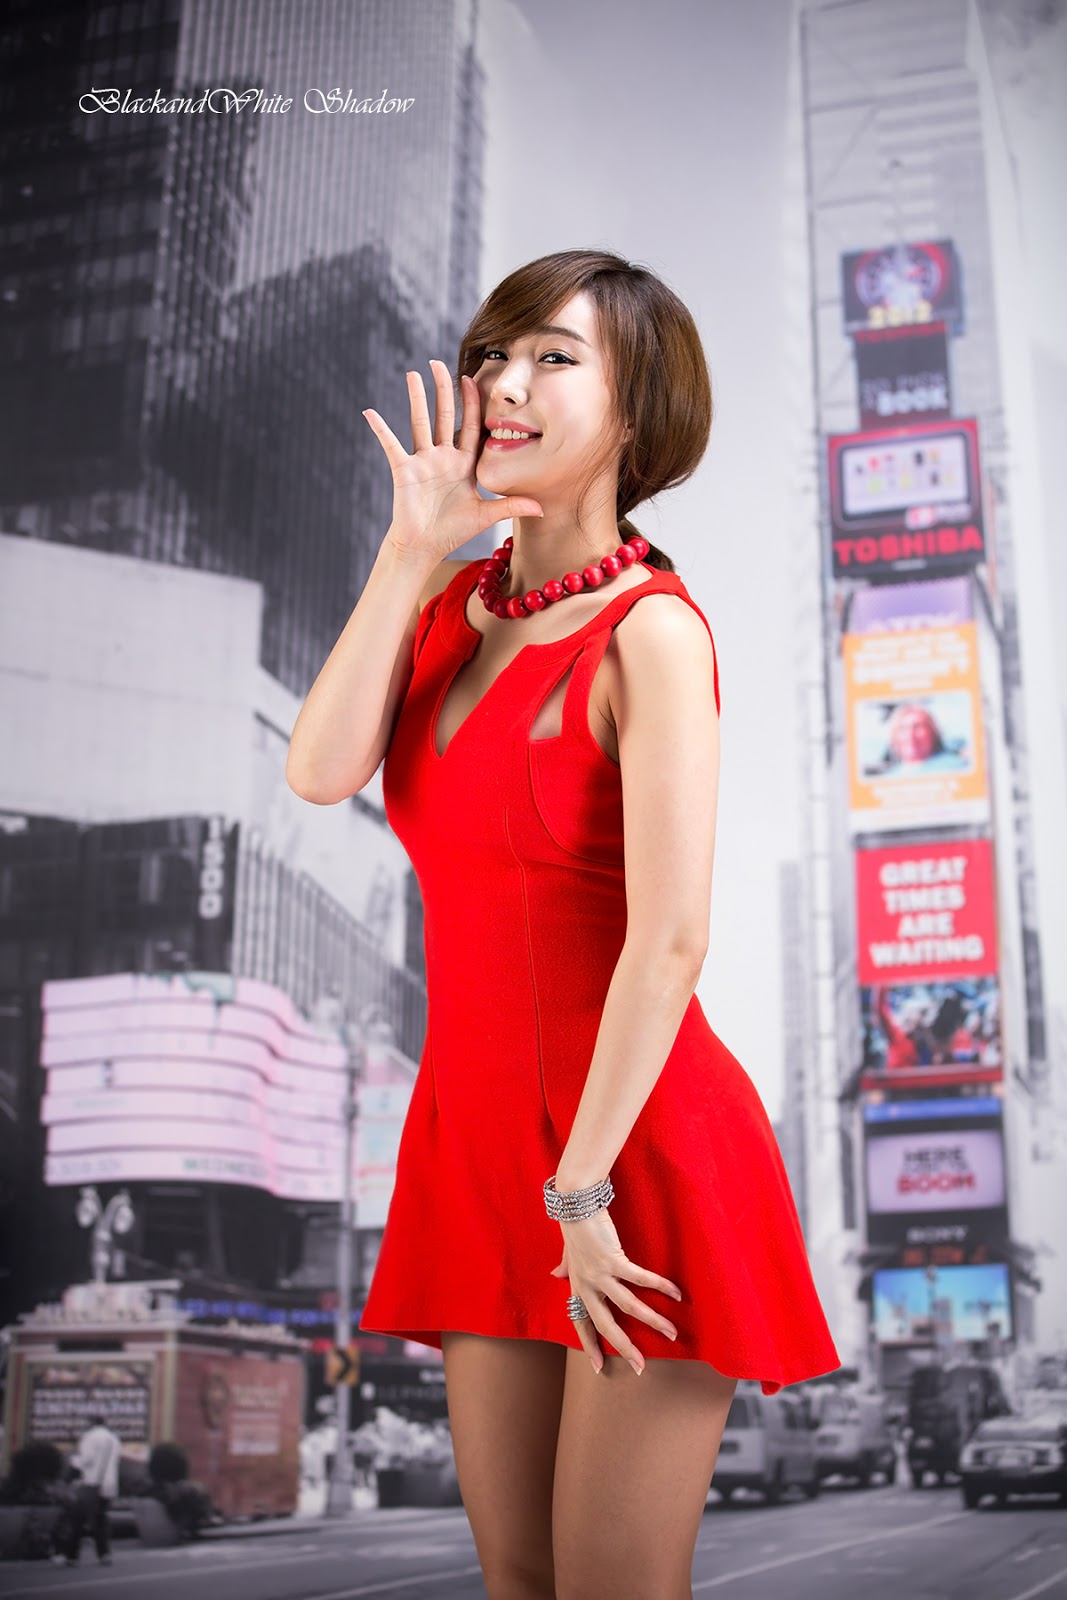 Hot Red - Im Min Young - very cute asian girl - girlcute4u.blogspot ...